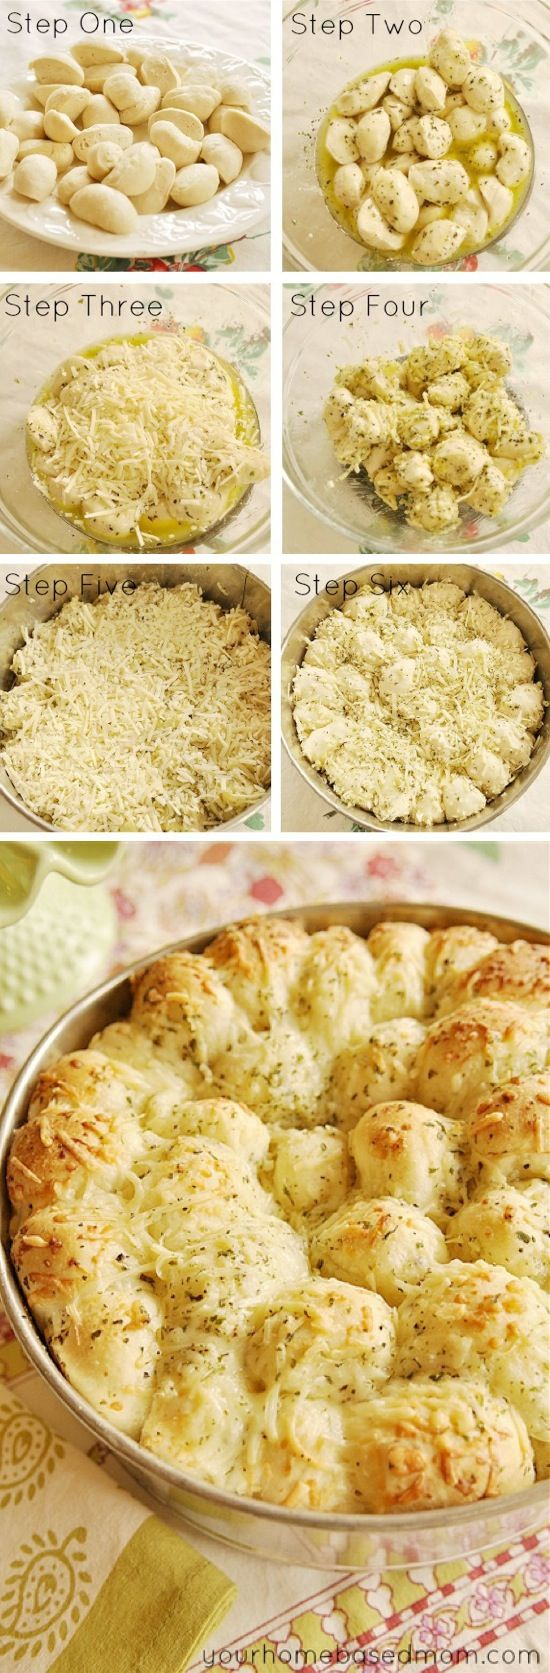 Garlic Cheese Pull-Apart Bread